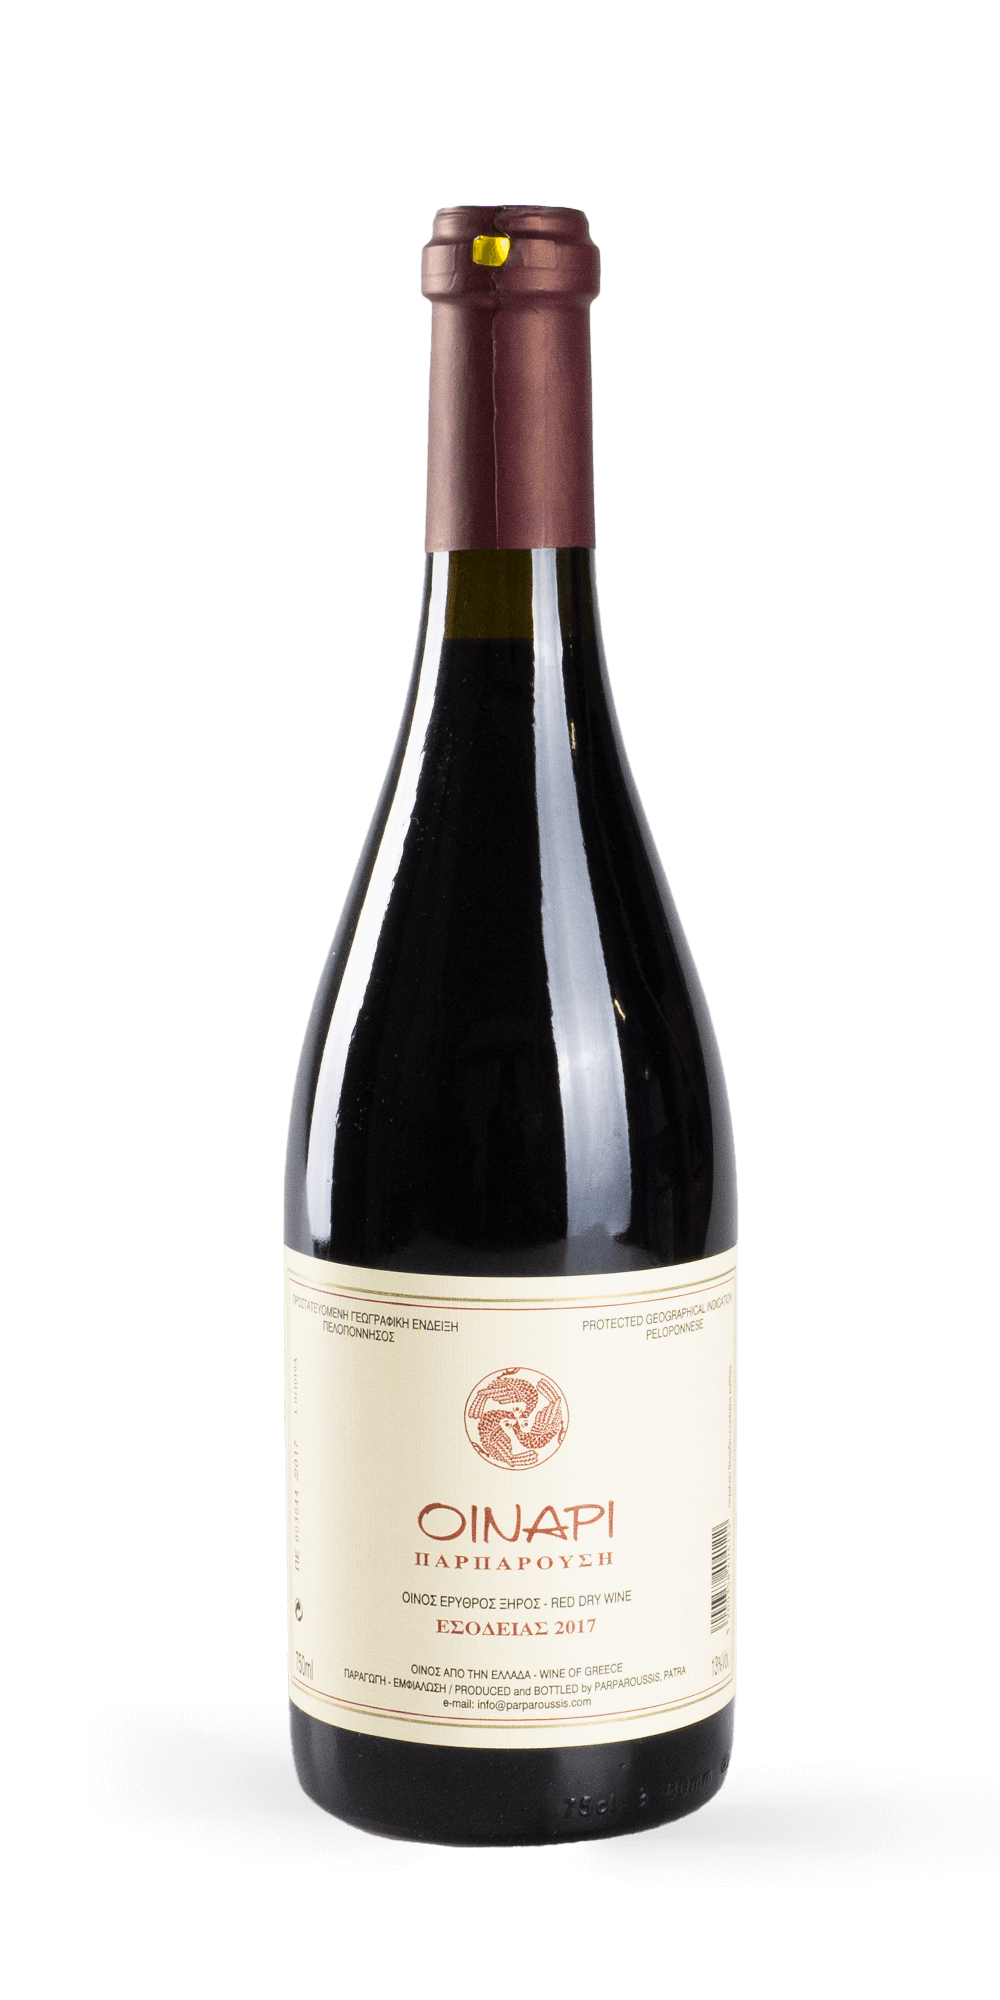 Oinari 2017 - Parparoussis Winery